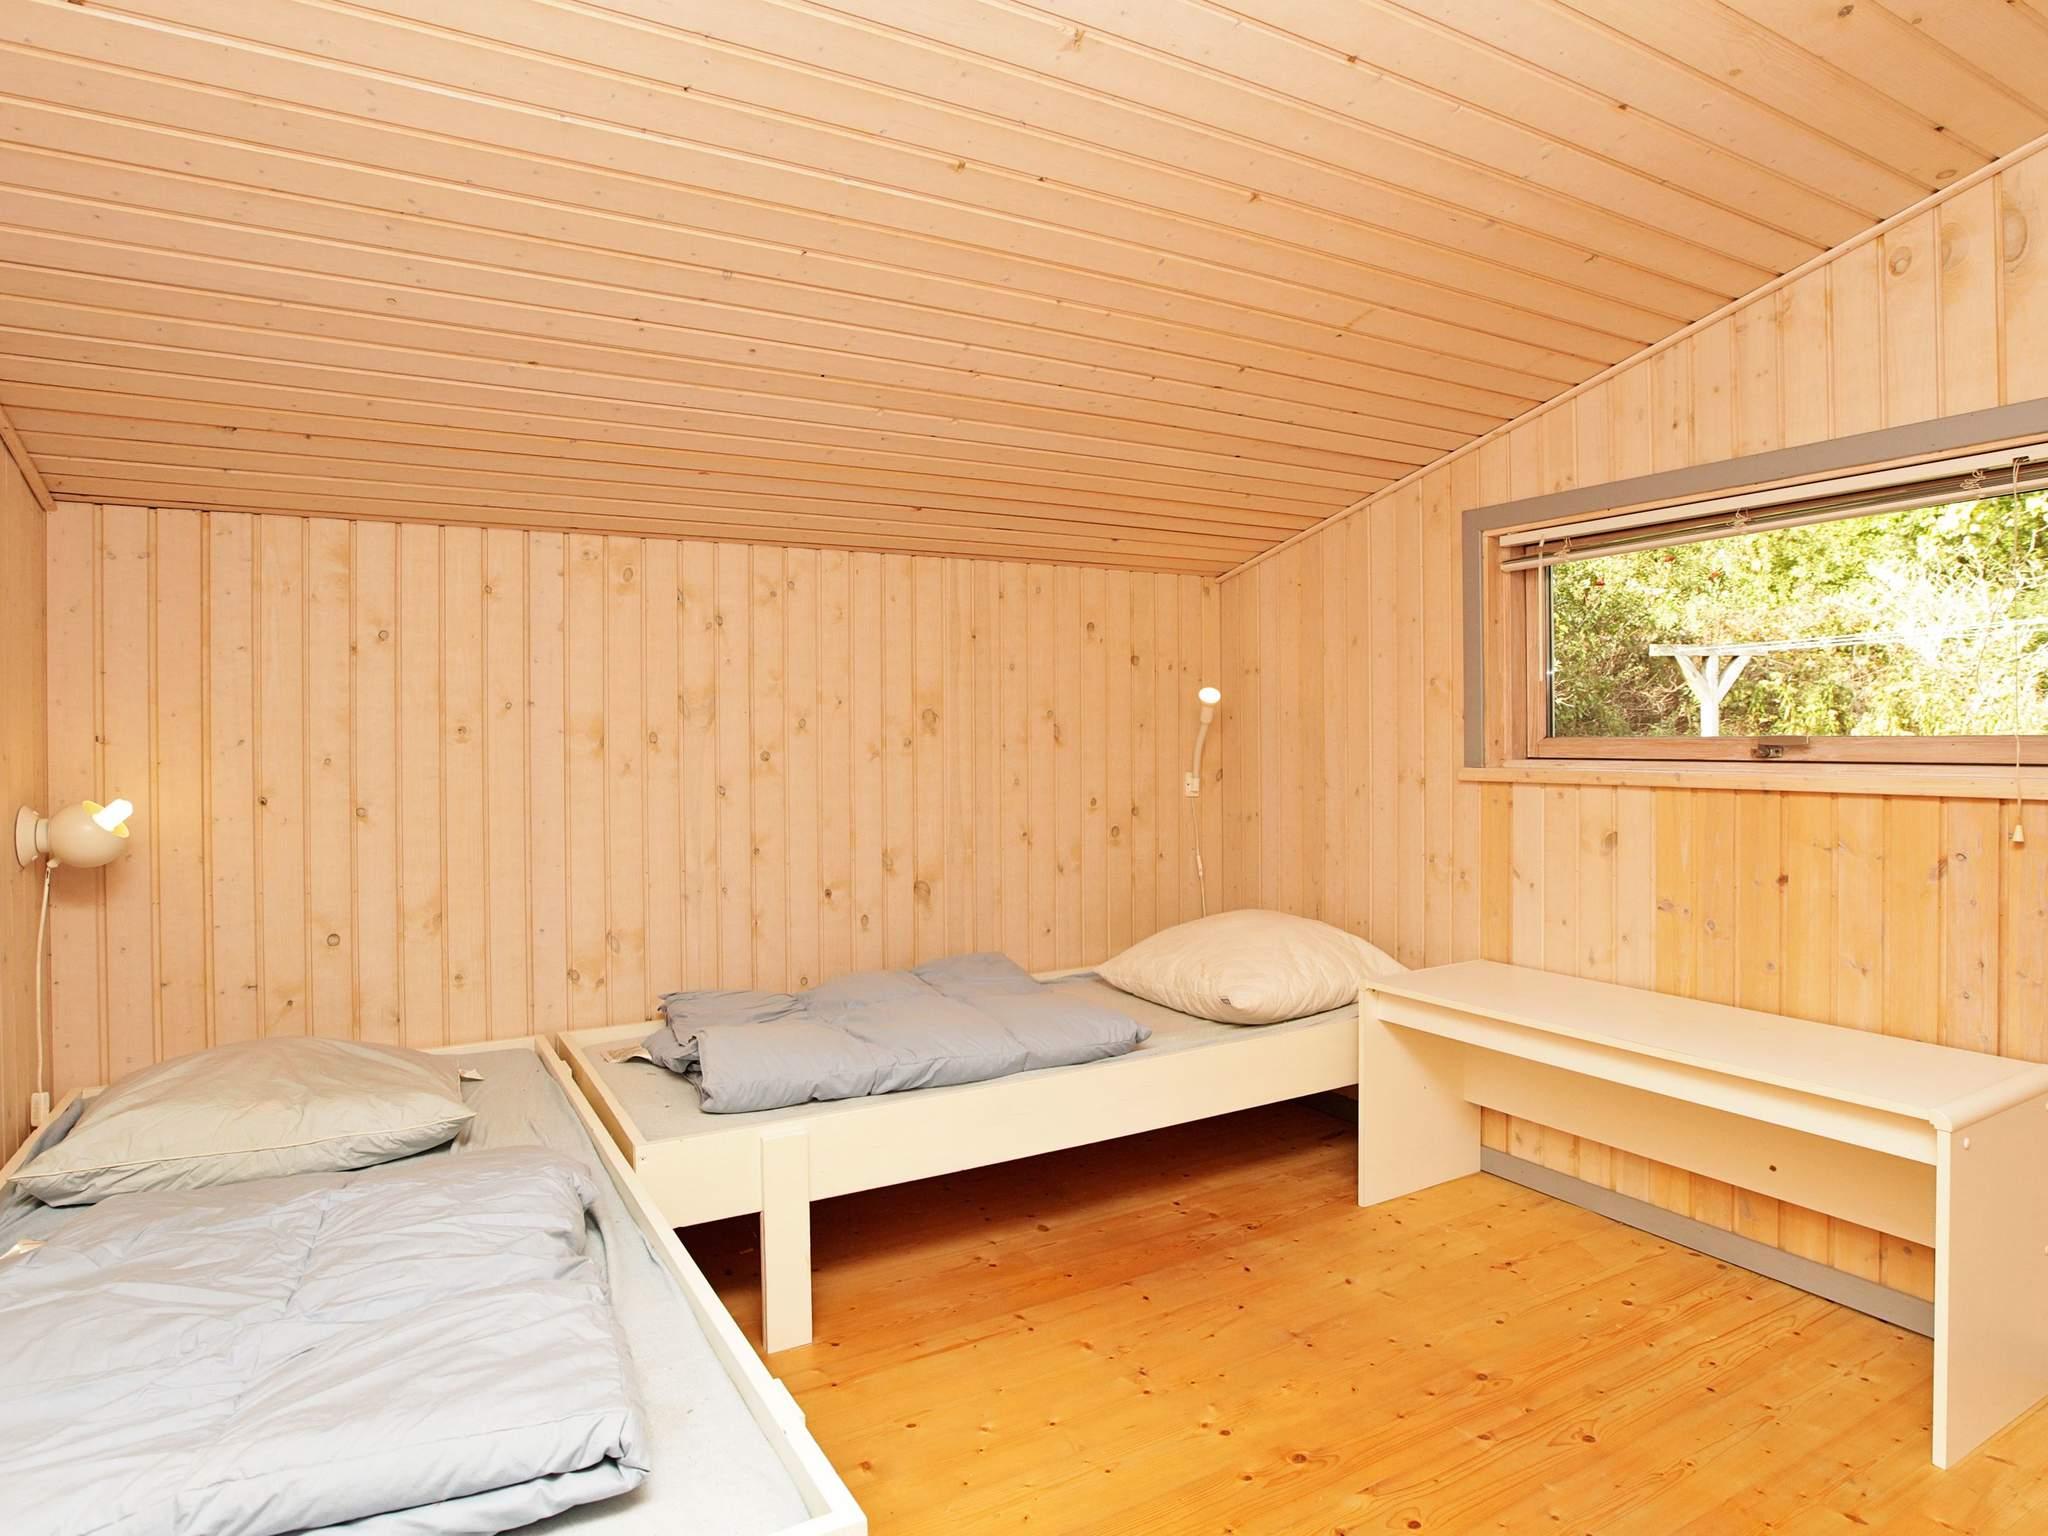 Ferienhaus Overby Lyng (93506), Nykøbing Sj, , Westseeland, Dänemark, Bild 16